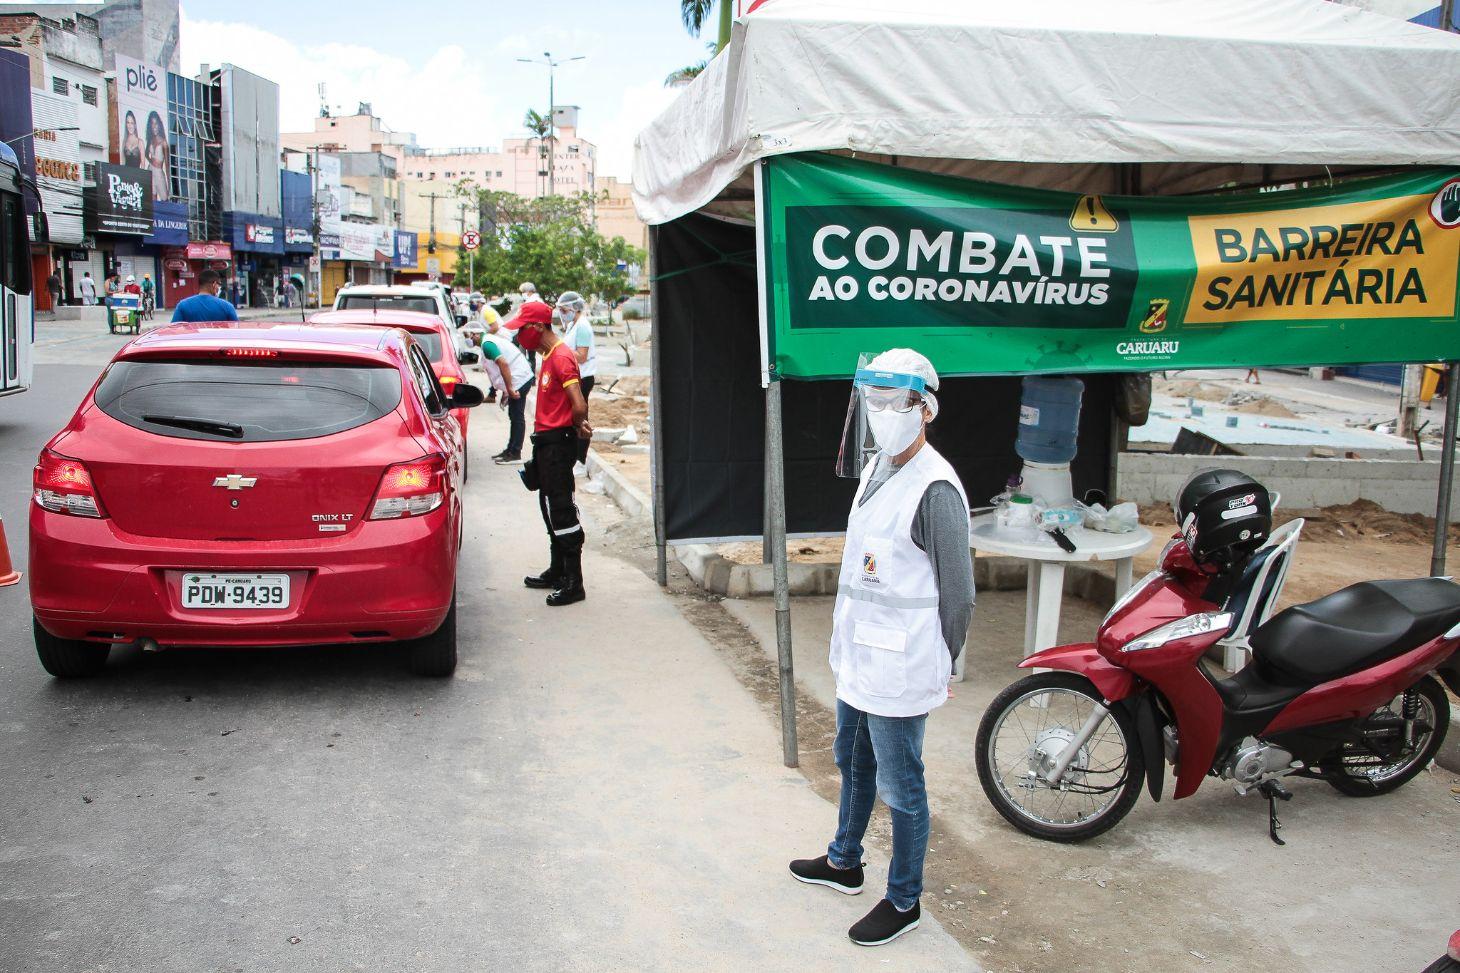 barreira sanitaria contra o novo coronavirus foto arnaldo felix prefeitura de caruaru